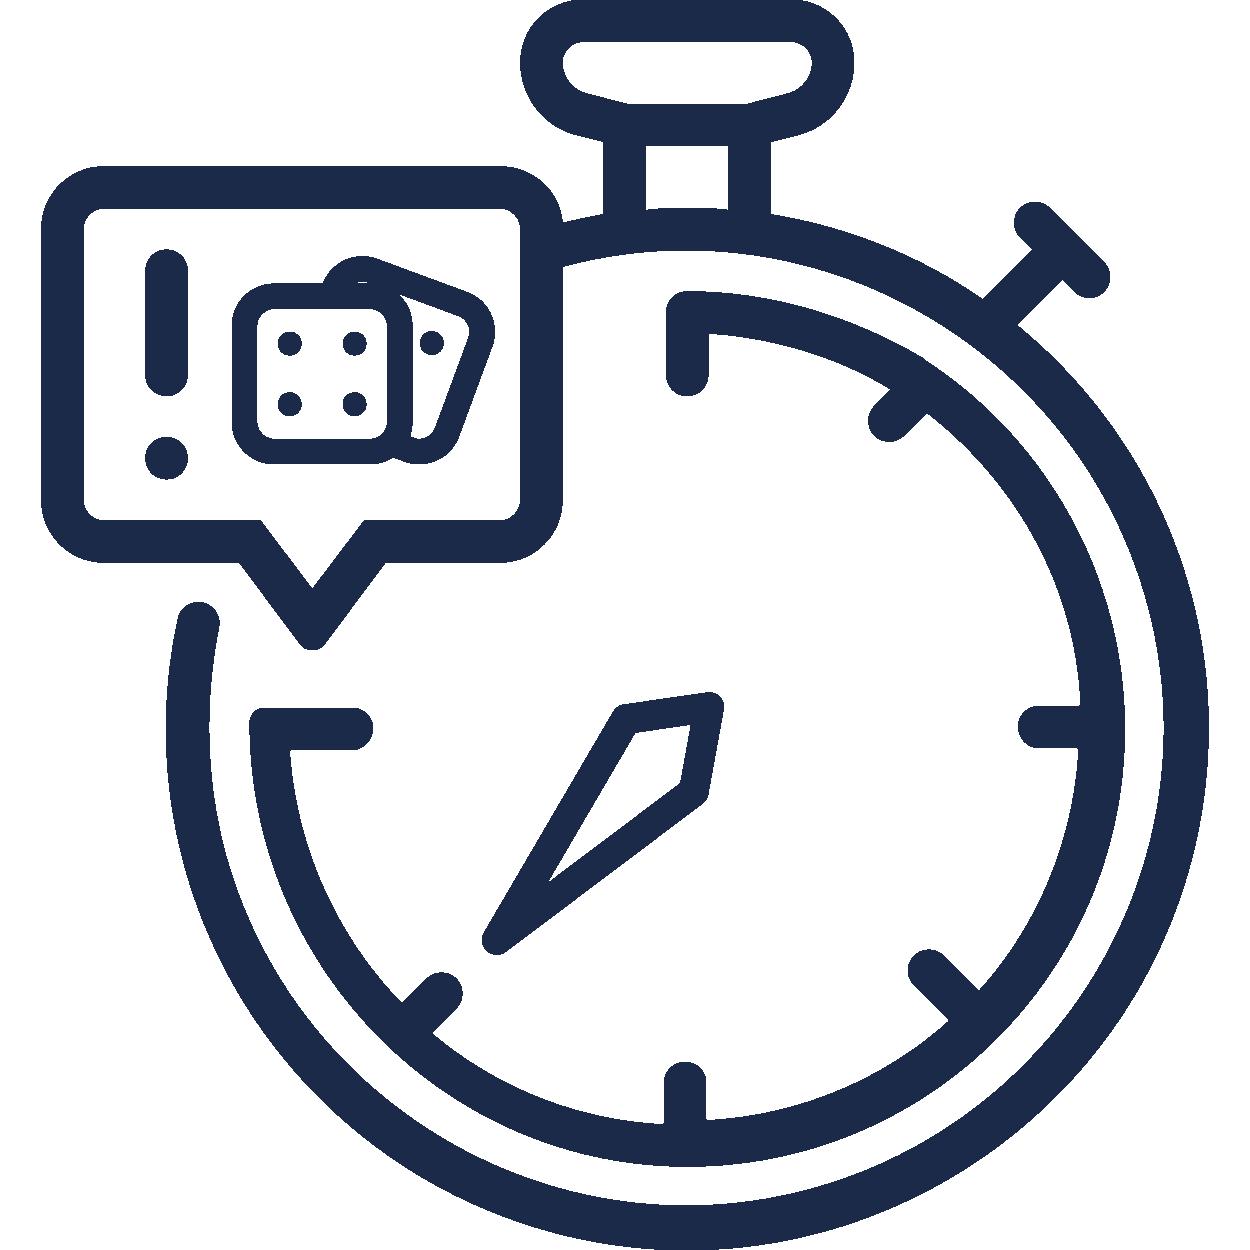 Maxgranser for speltid icon